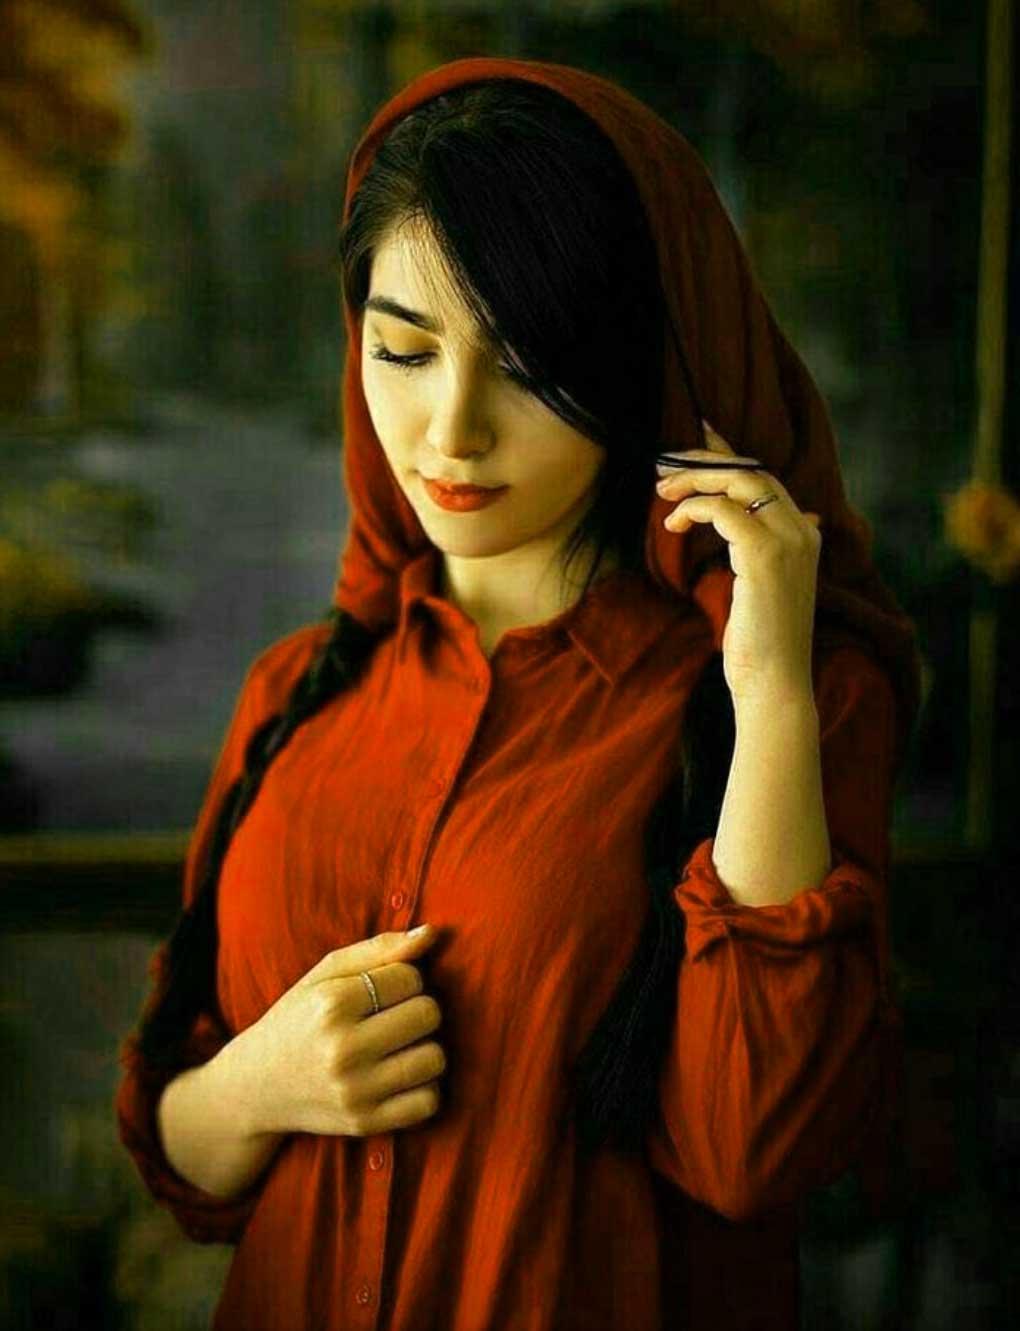 Best Attractive Whatsapp Dp Pics Hd Free